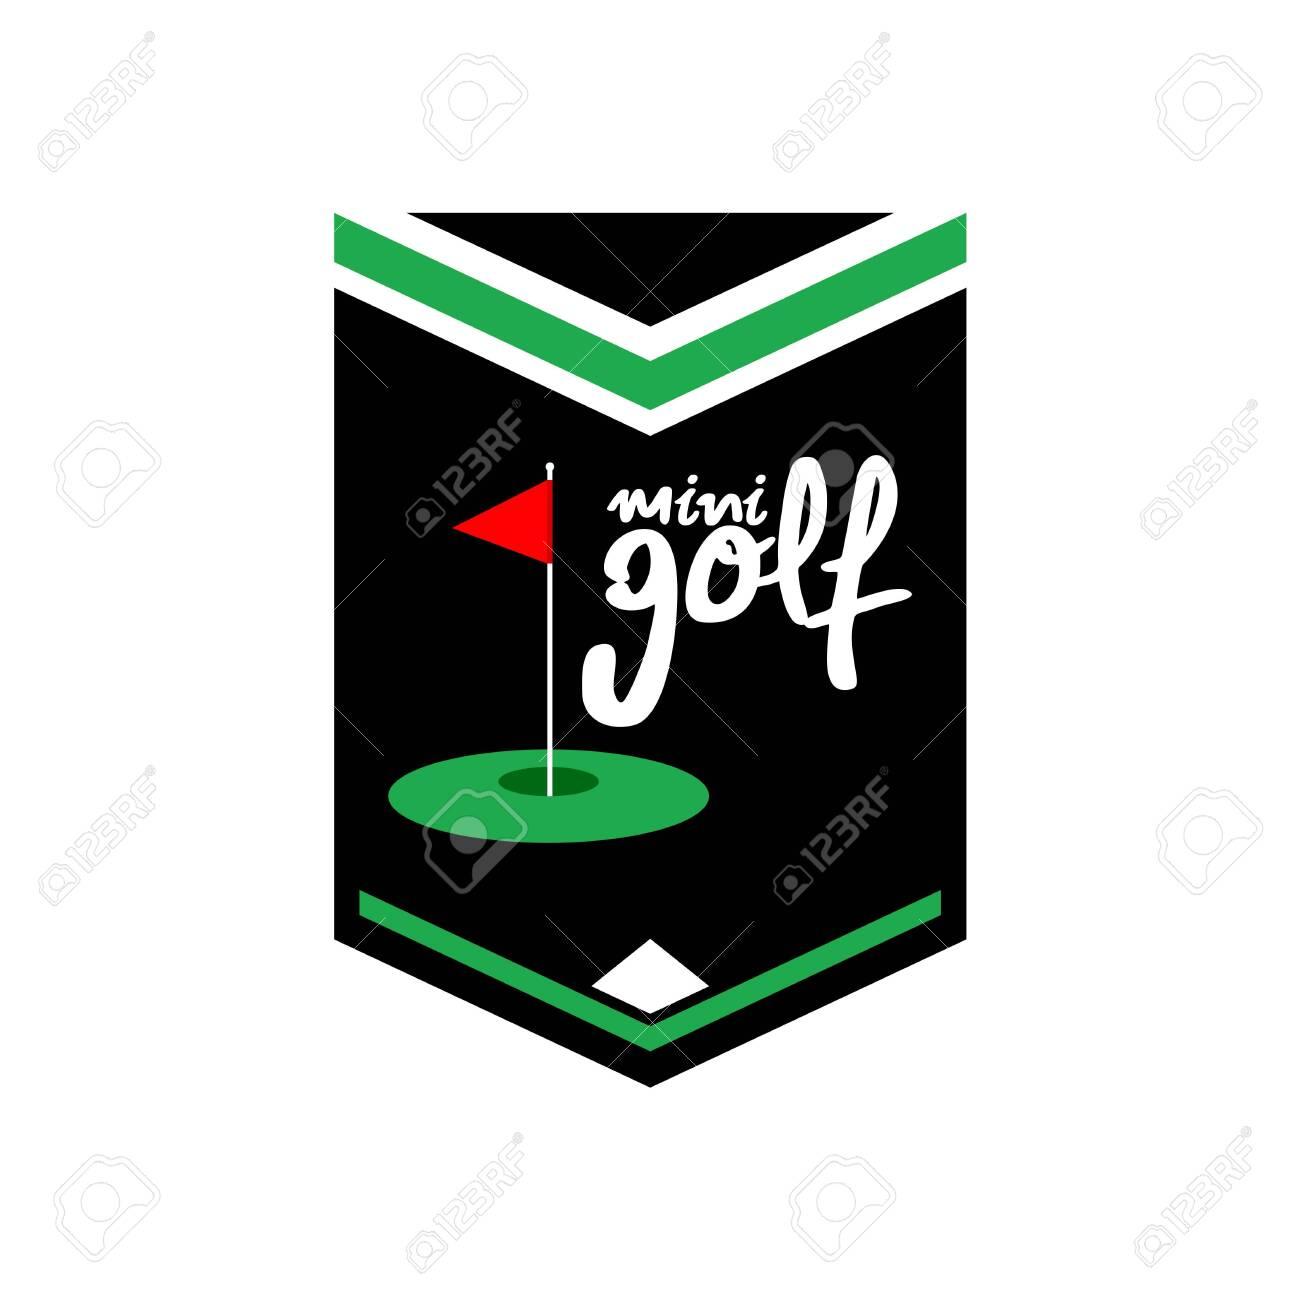 Mini Golf Emblem Design Royalty Free Cliparts Vectors And Stock Illustration Image 128790937